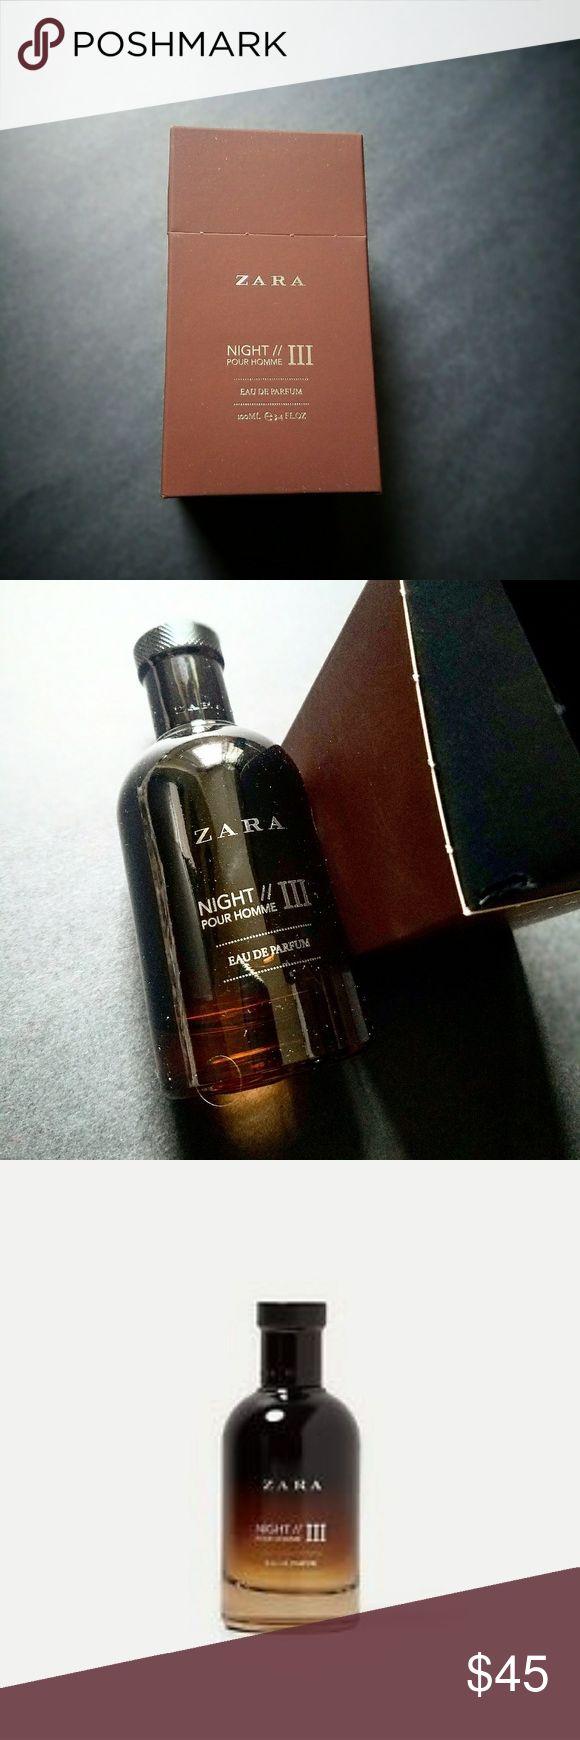 ZARA NIGH POUR HOMME // EAU DE PARFUM ZARA Man Eau de Parfum Night pour Home III 100ml/3.4 fl Oz Zara Other